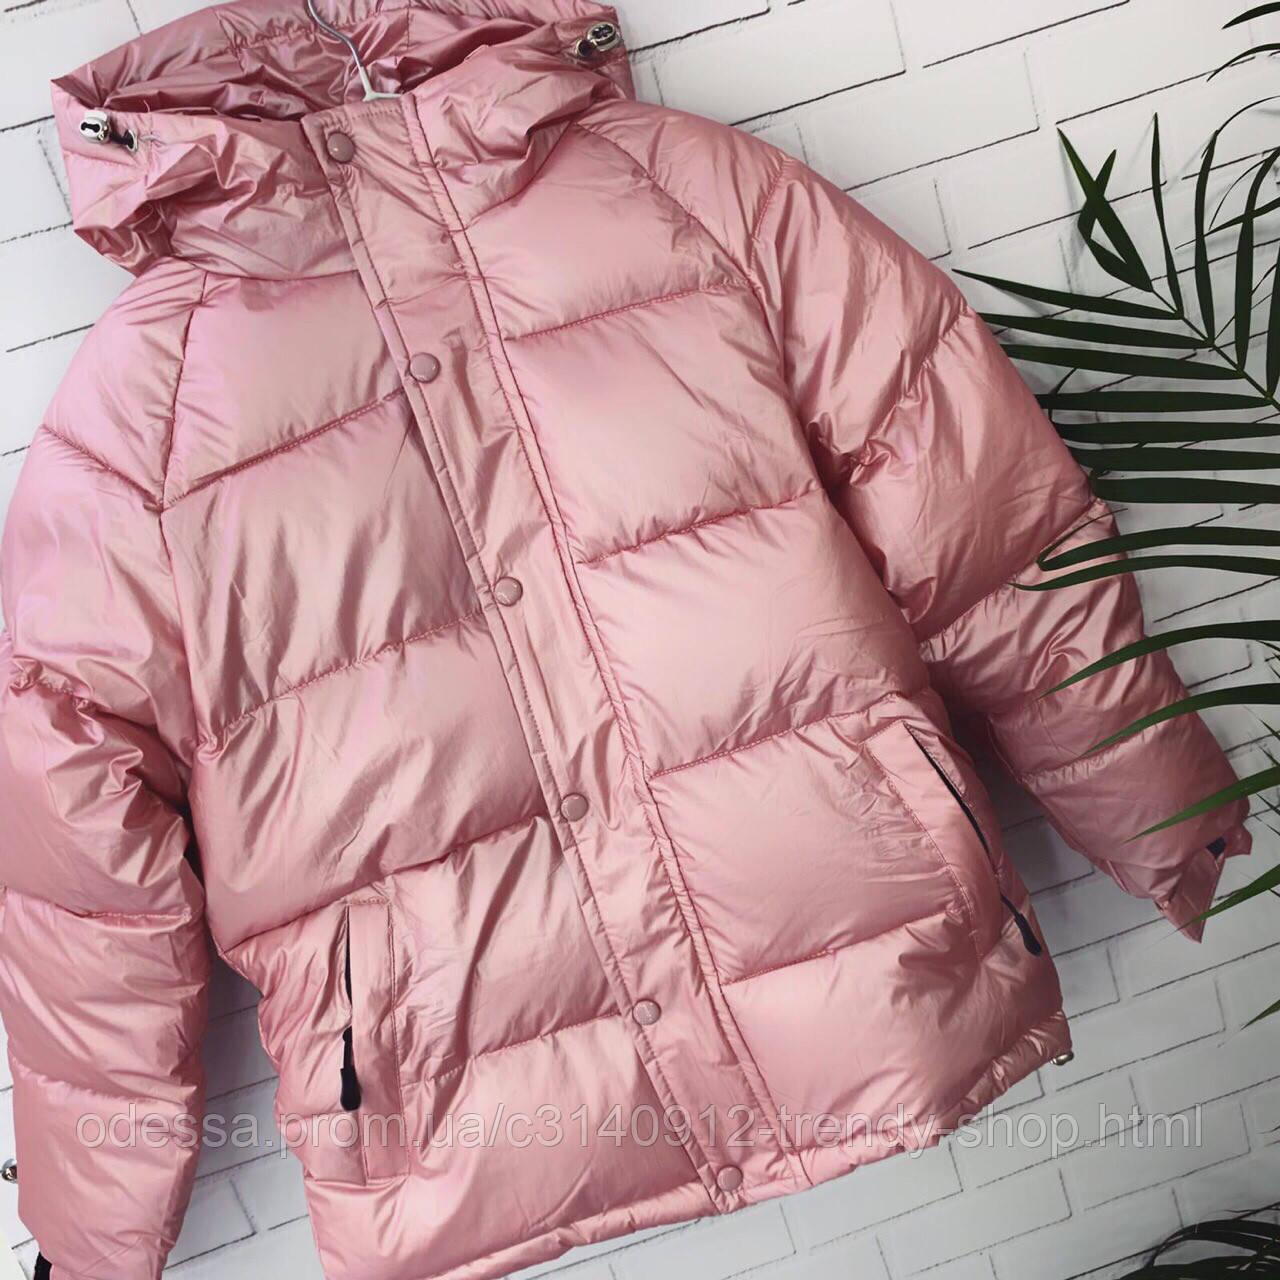 Куртка женская тёплая марсала, черный, пудра 42 44 46